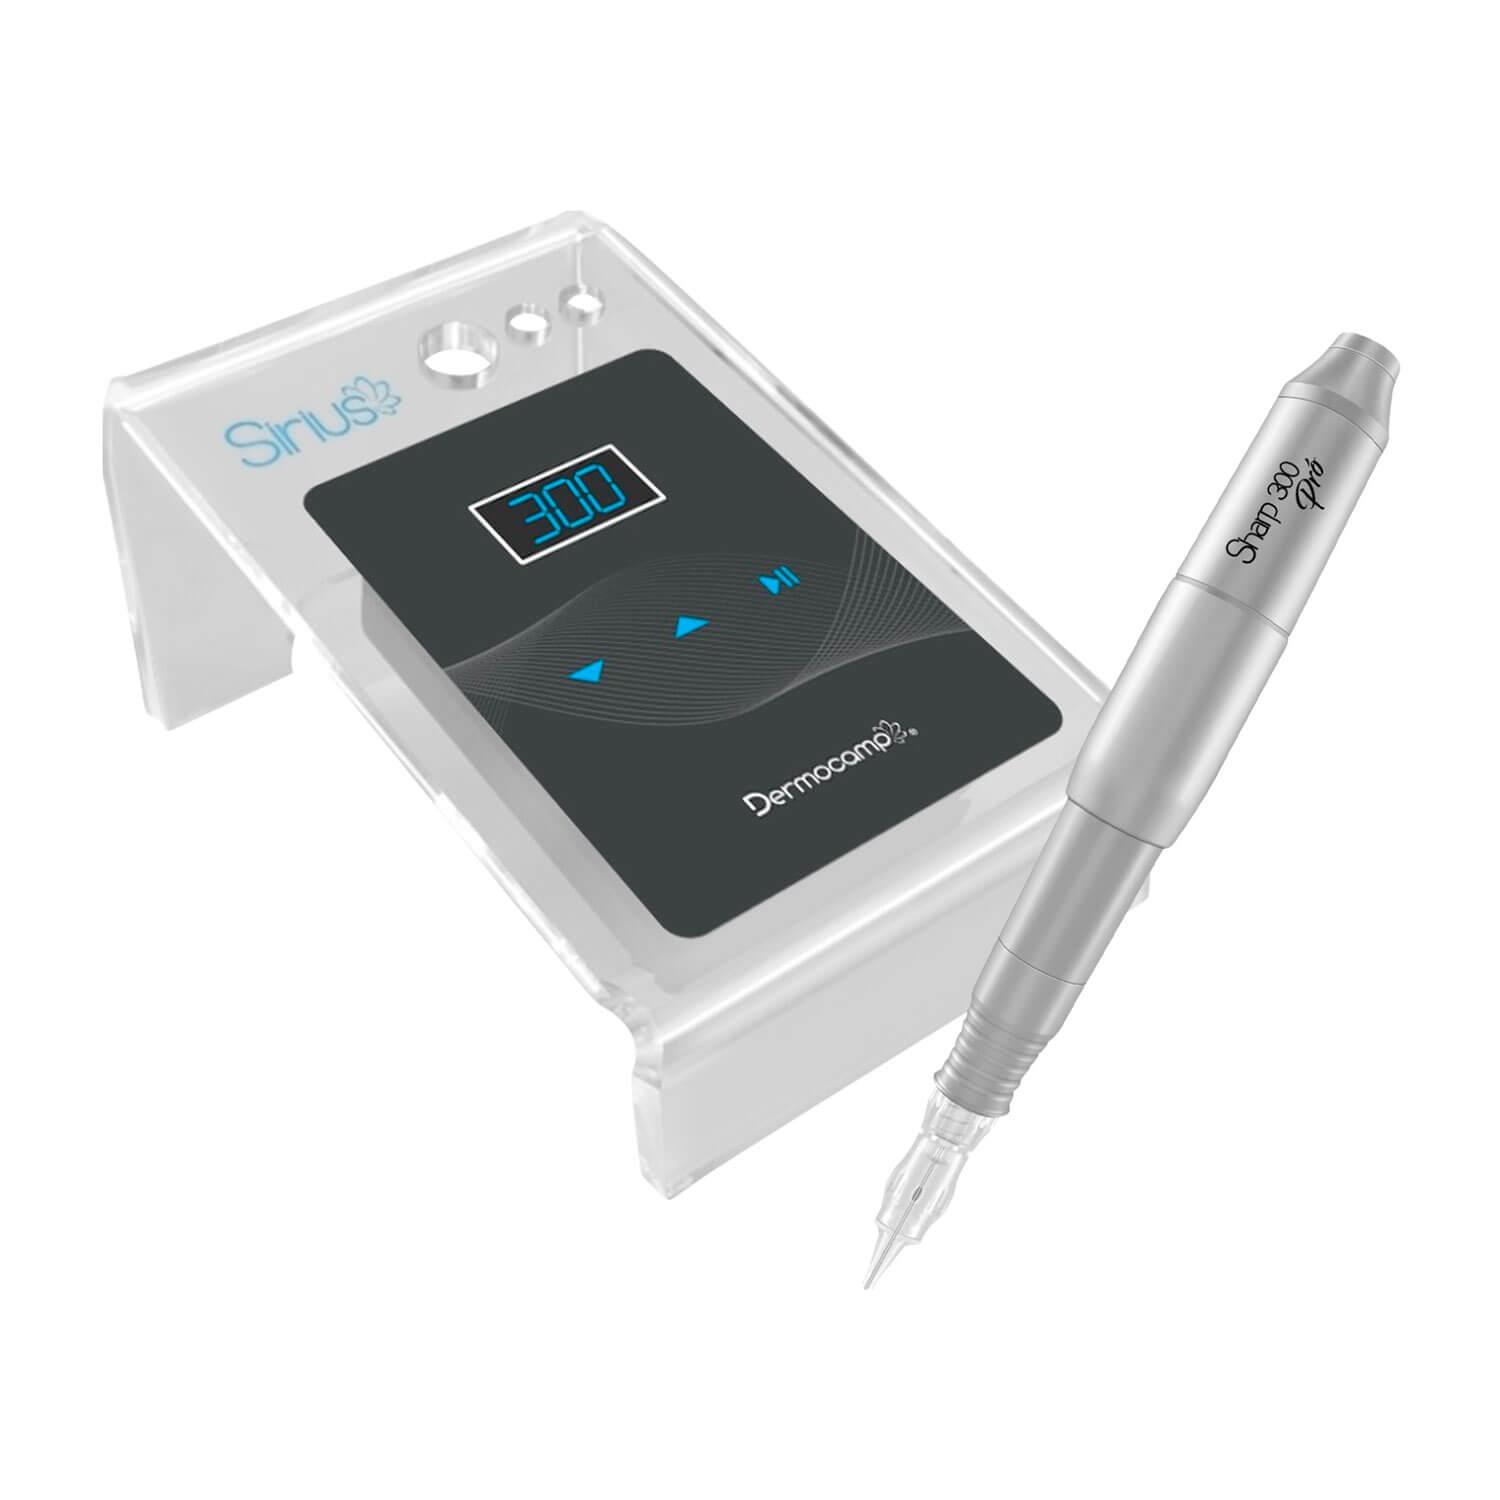 Combo Controle Digital Sirius Dark + Dermografo Sharp 300 Pró Prata